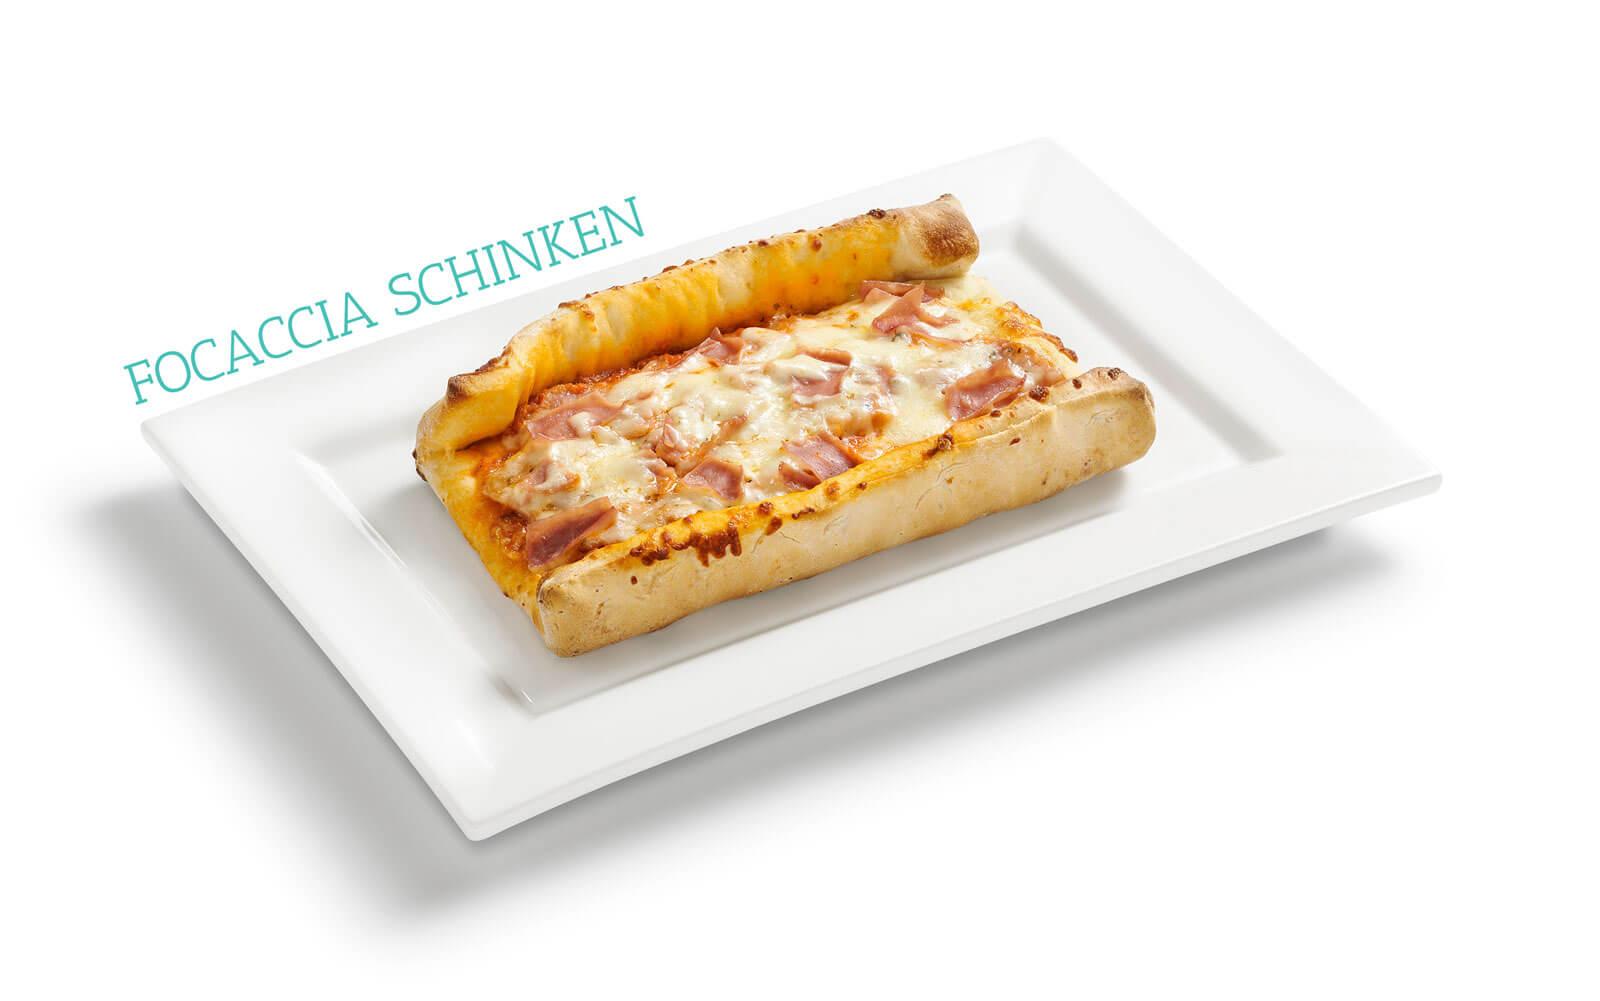 3305_Focaccia_Schinken_TIGT-1